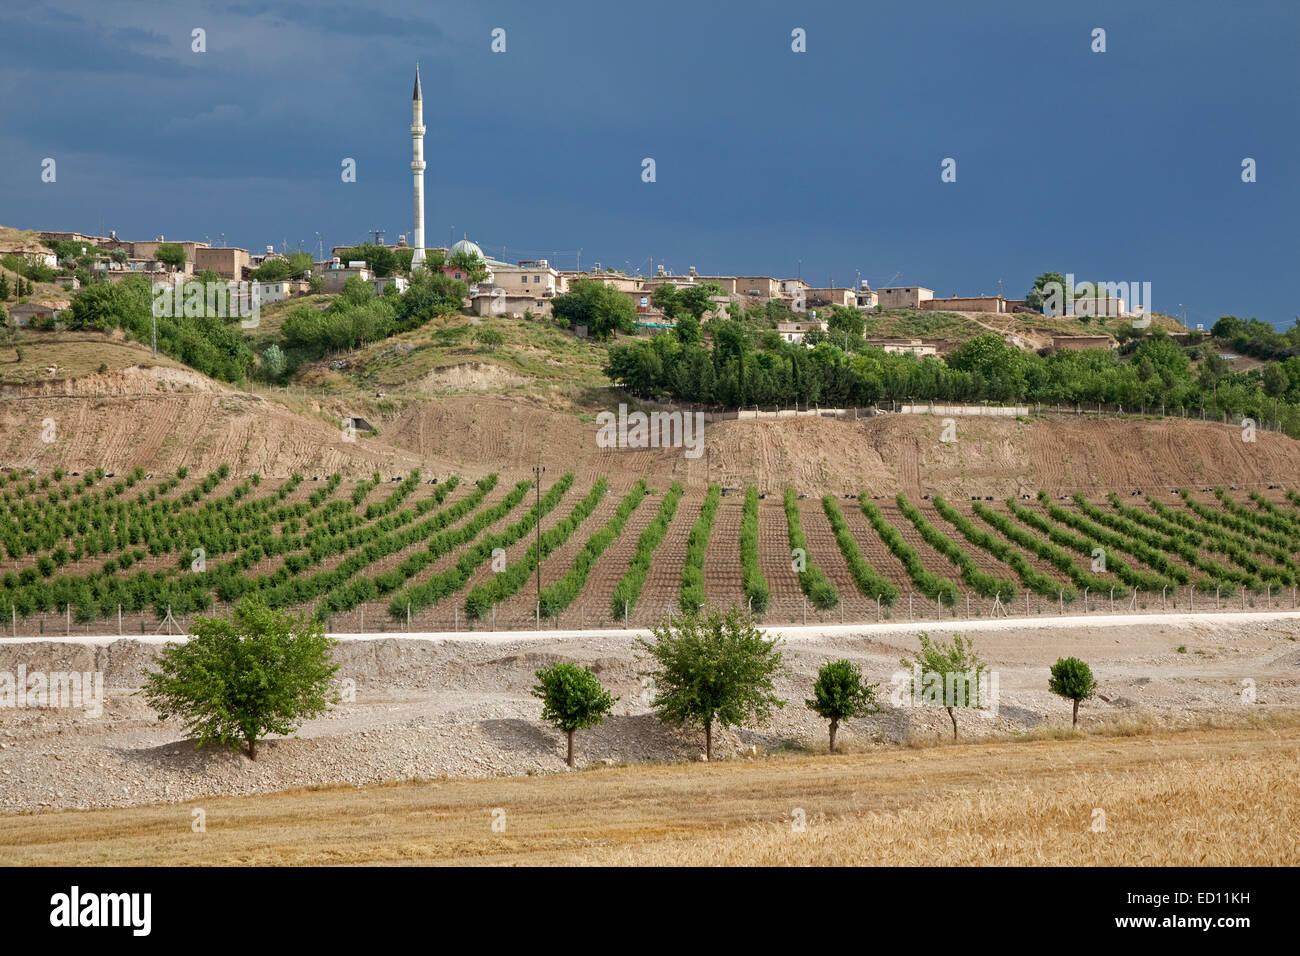 Vineyard and minaret in rural village in Anatolia, Turkey - Stock Image